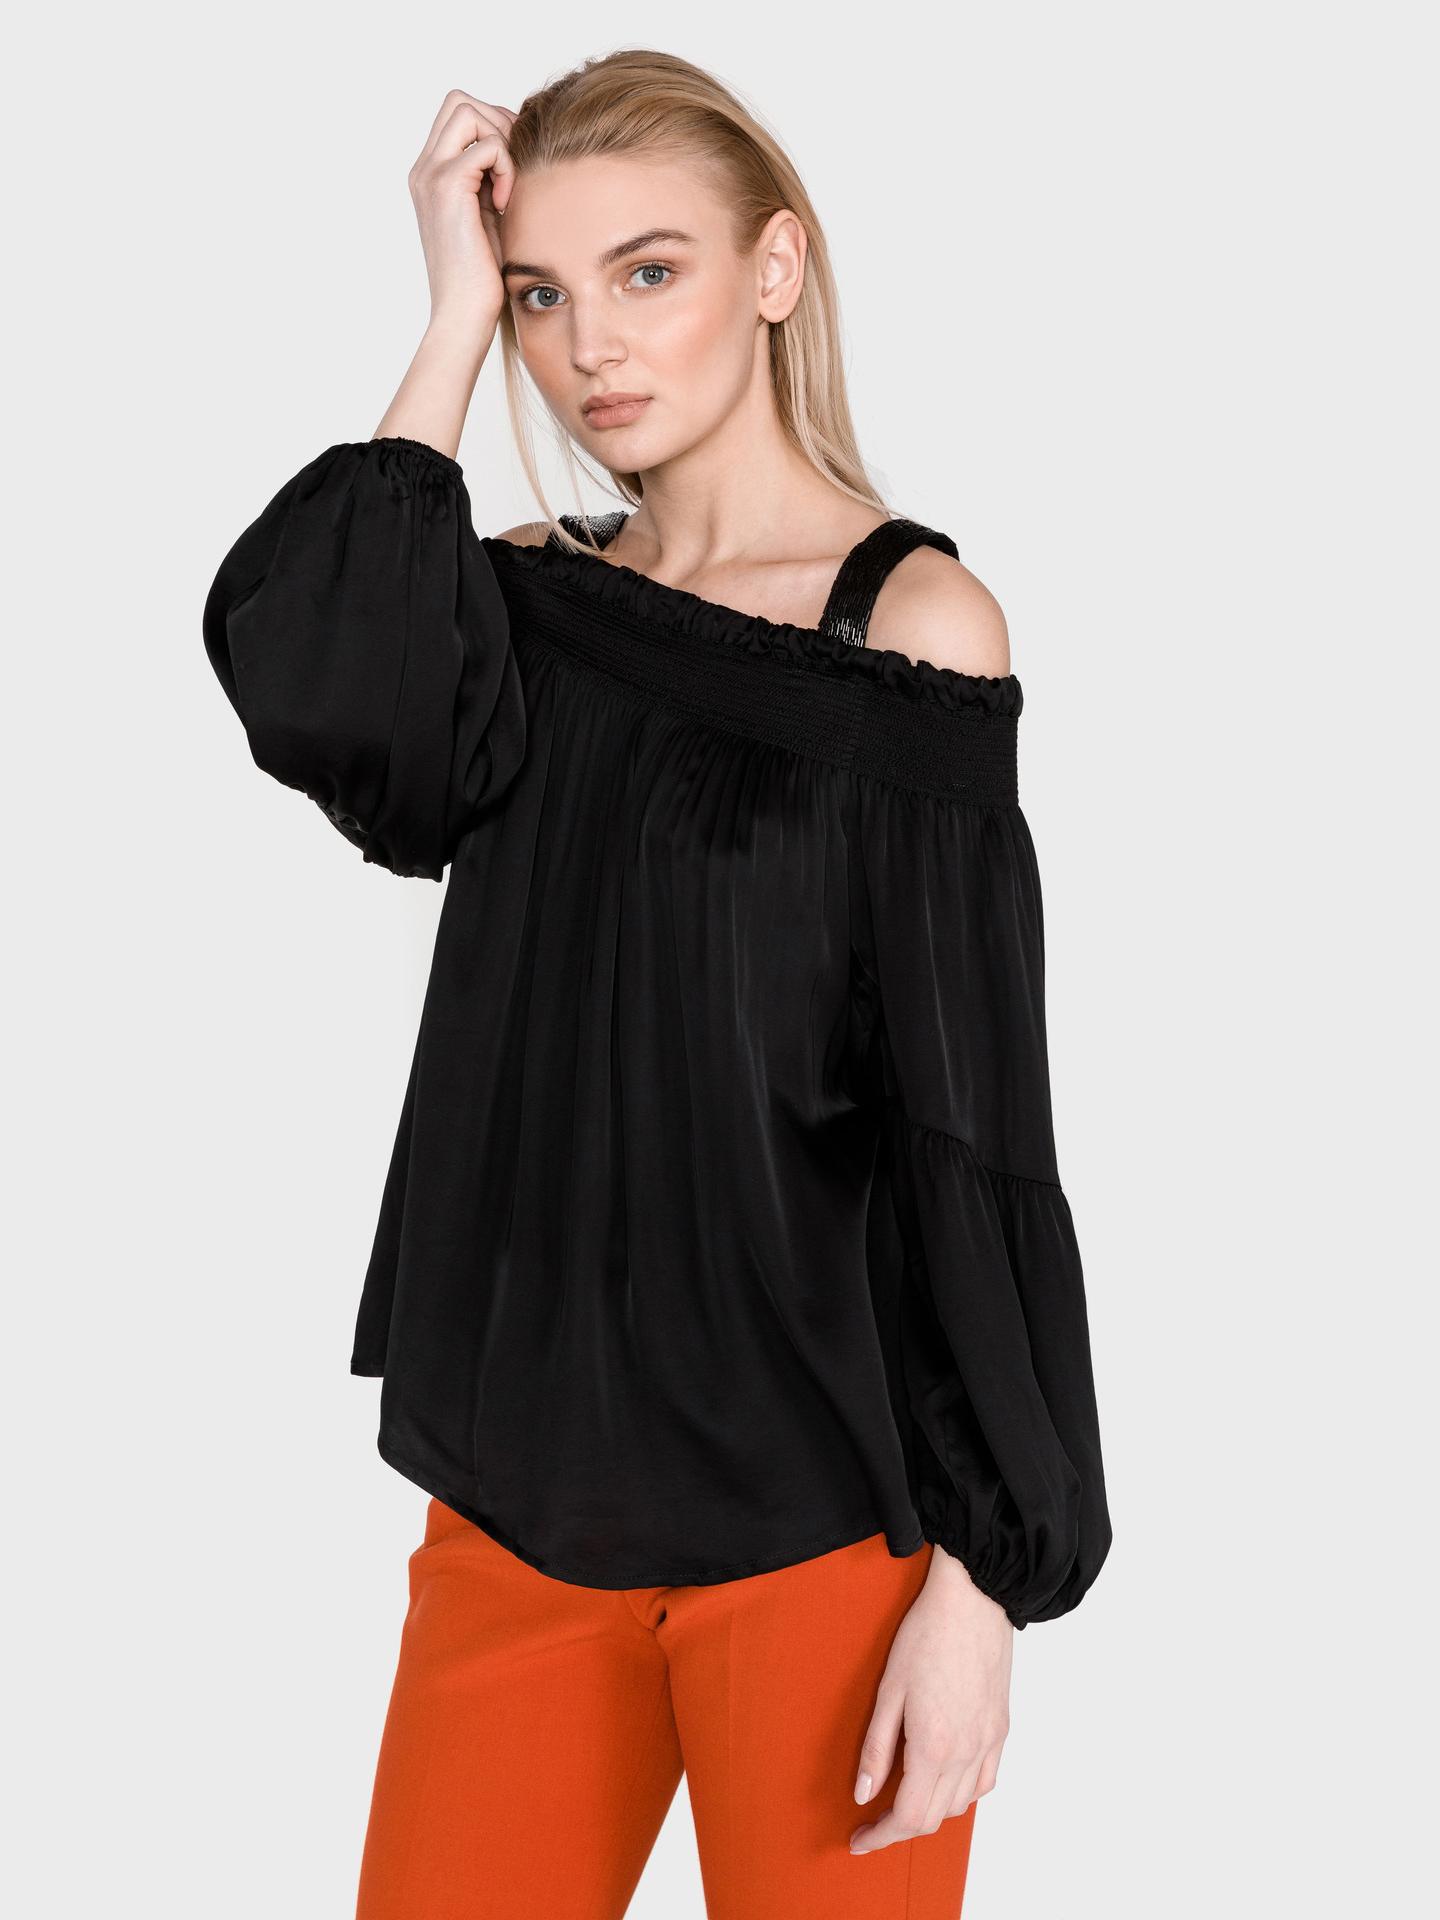 Guess black blouse